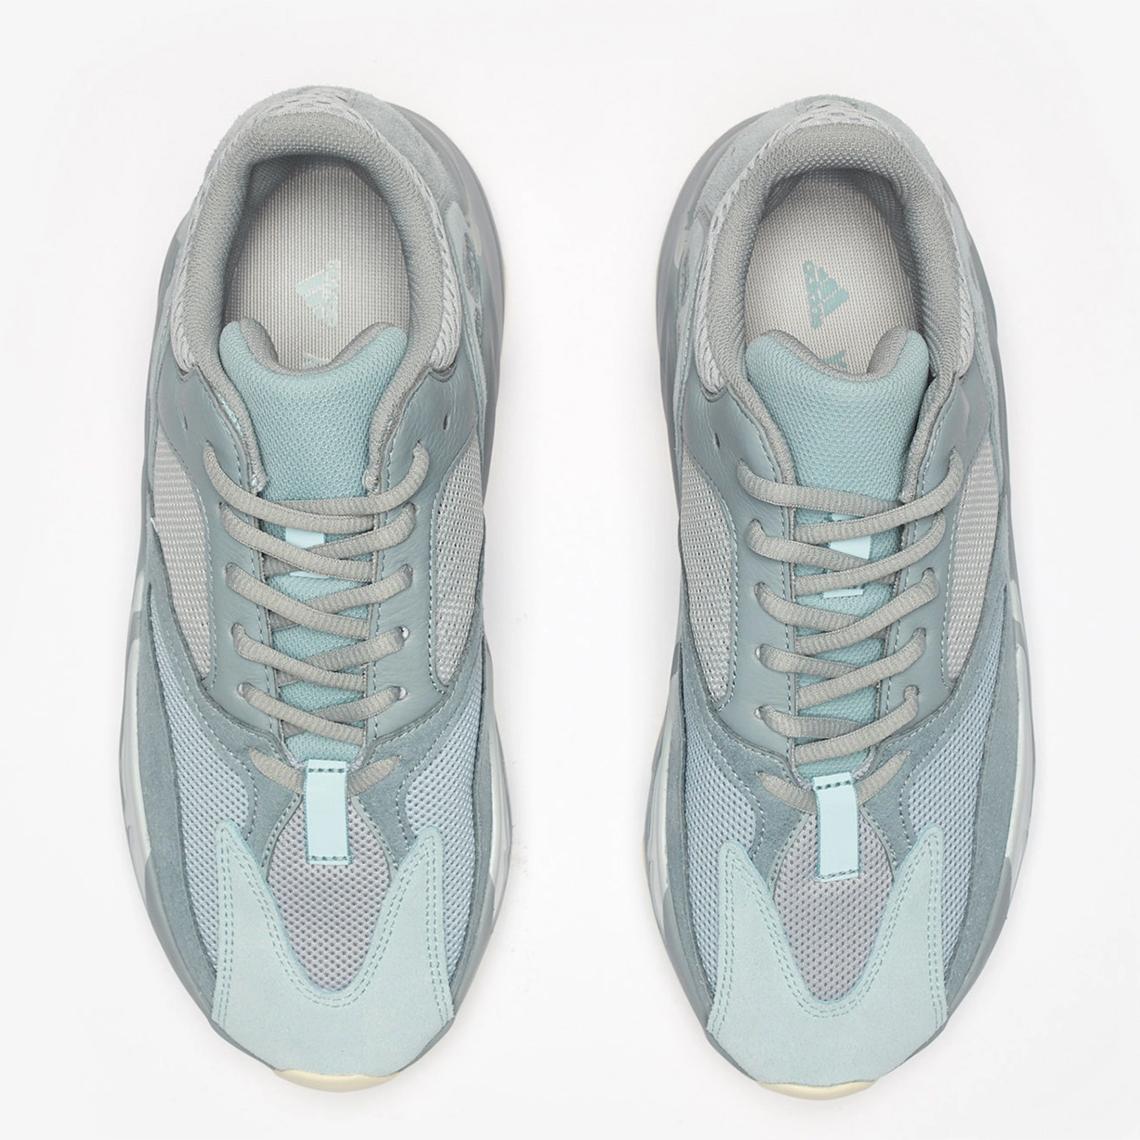 f63a6c5dcbf adidas Yeezy 700 Inertia - Official Store List